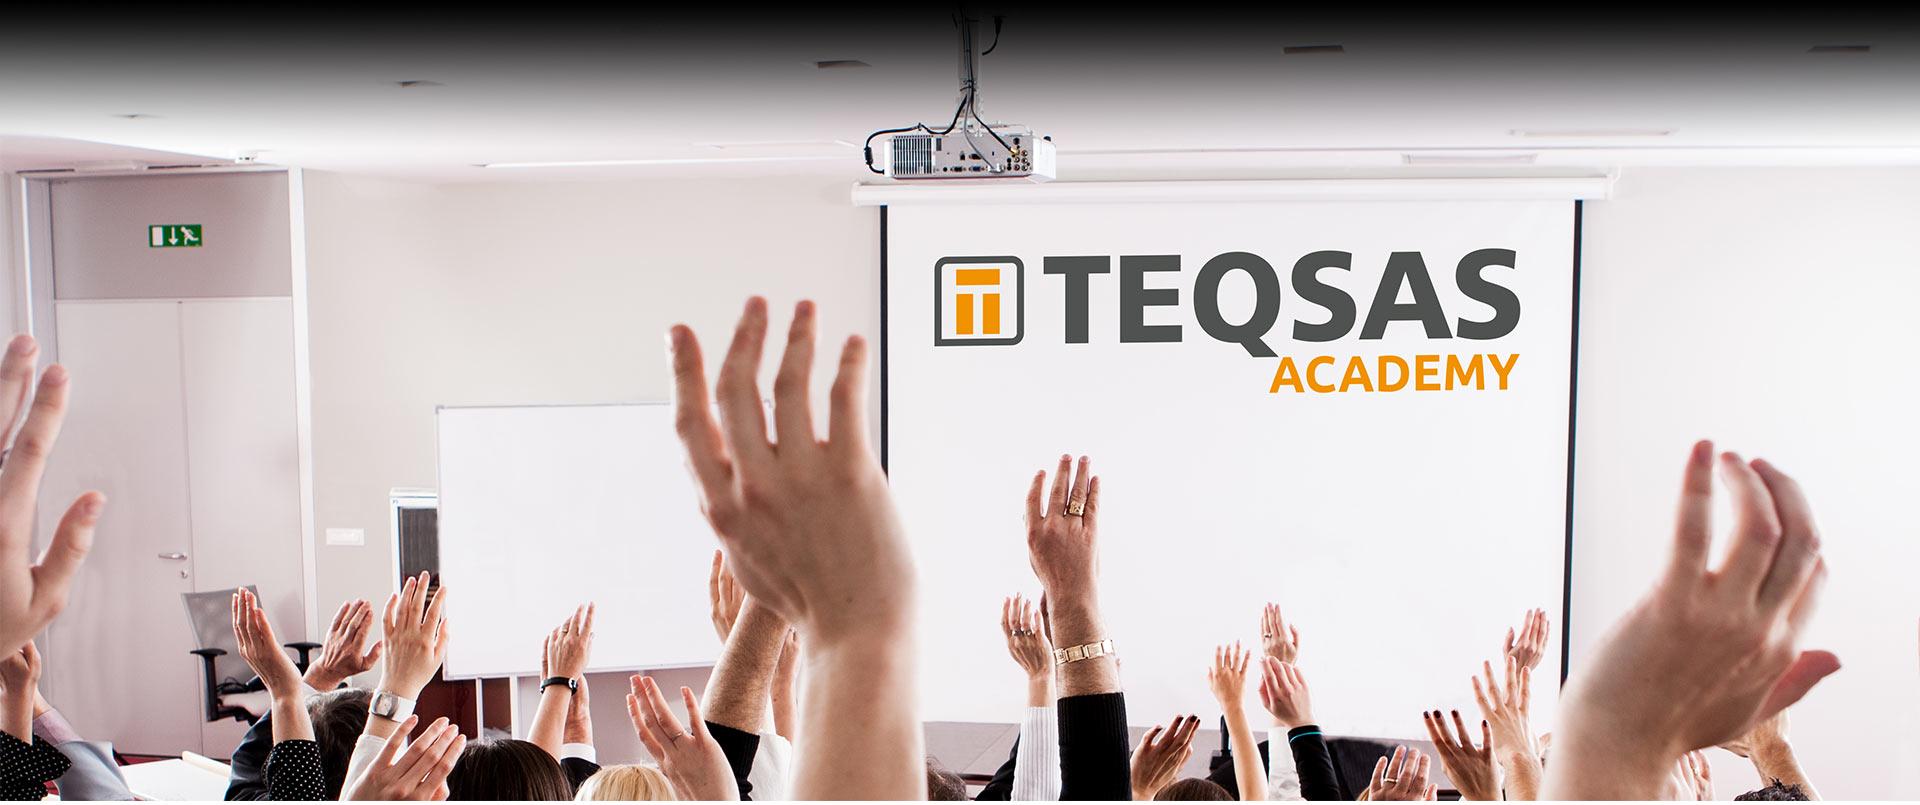 Teqsas Academy